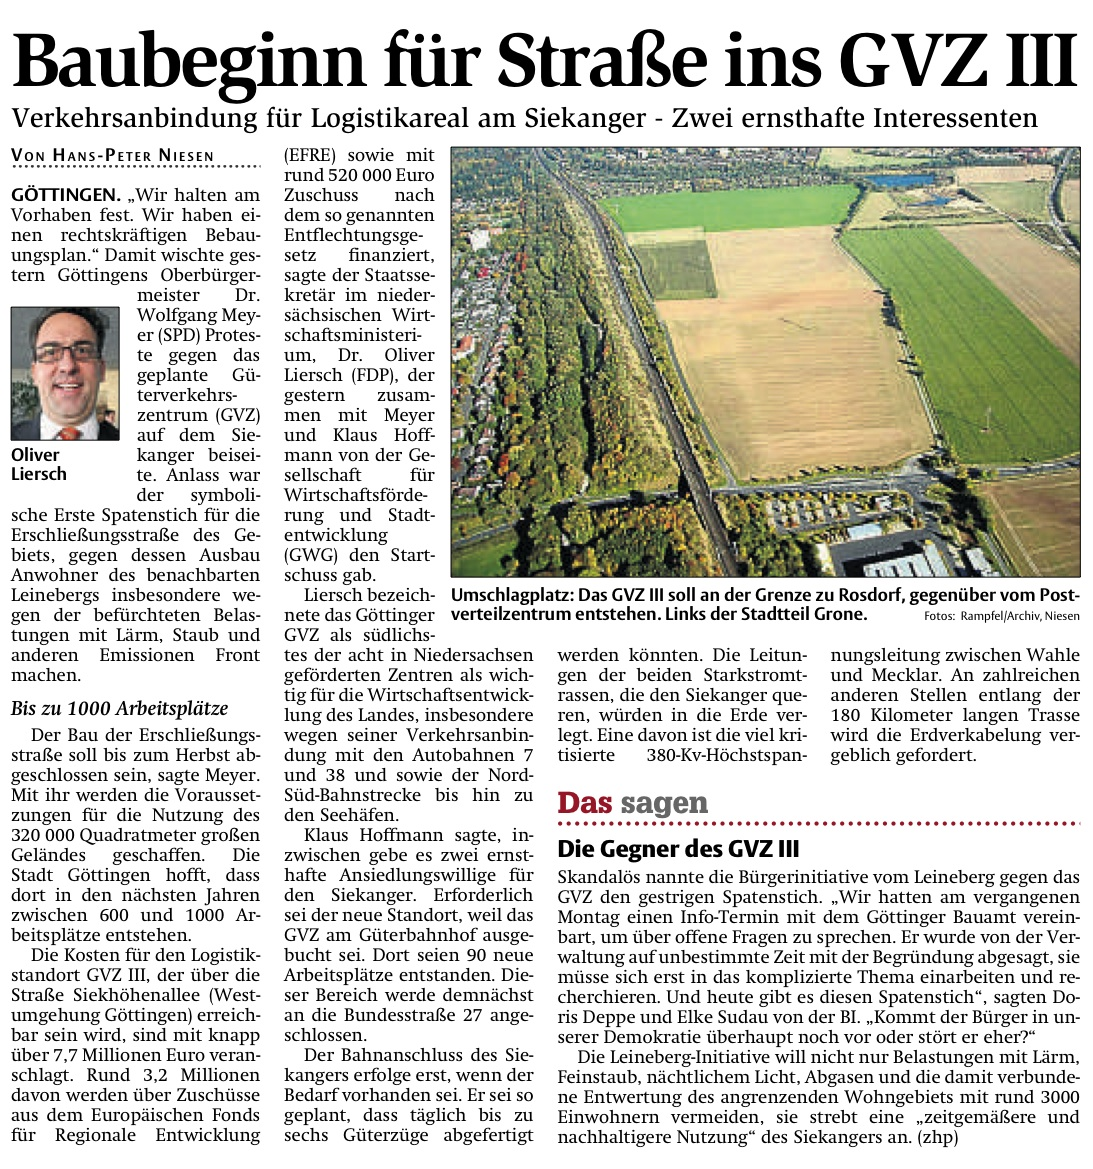 Baubeginn GVZ iii Siekanger